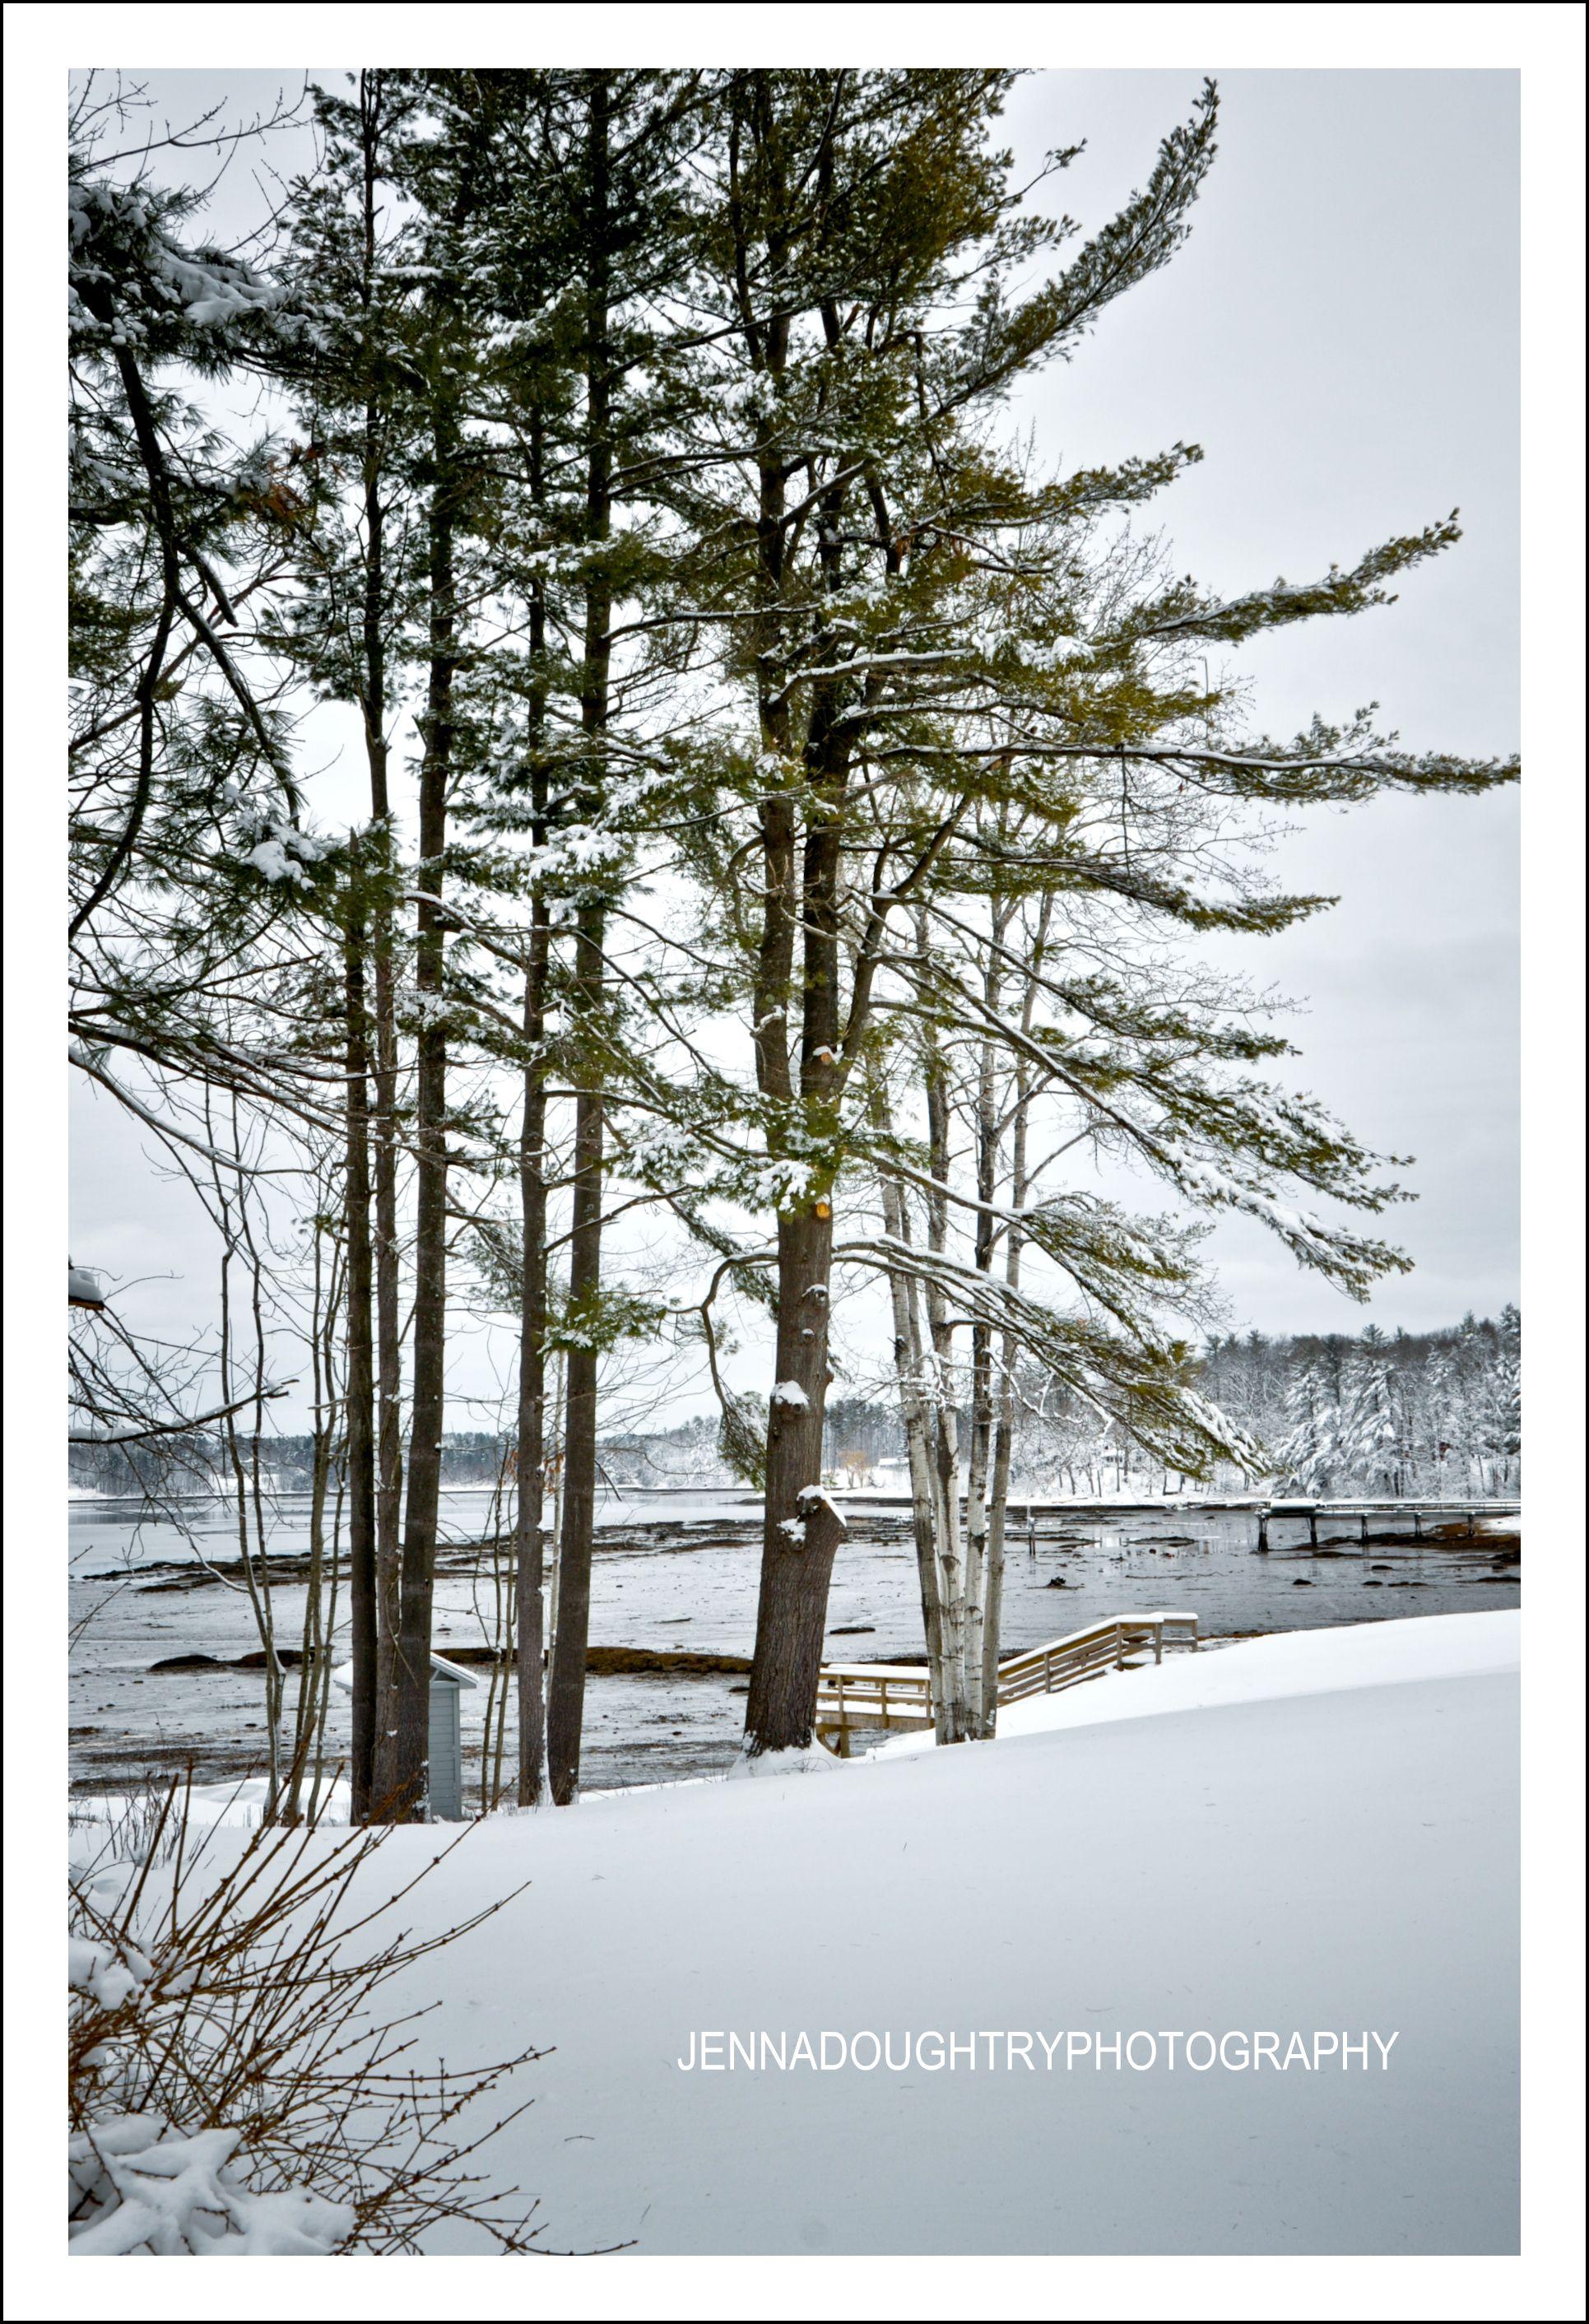 Winter - Southern Maine Coast 2012